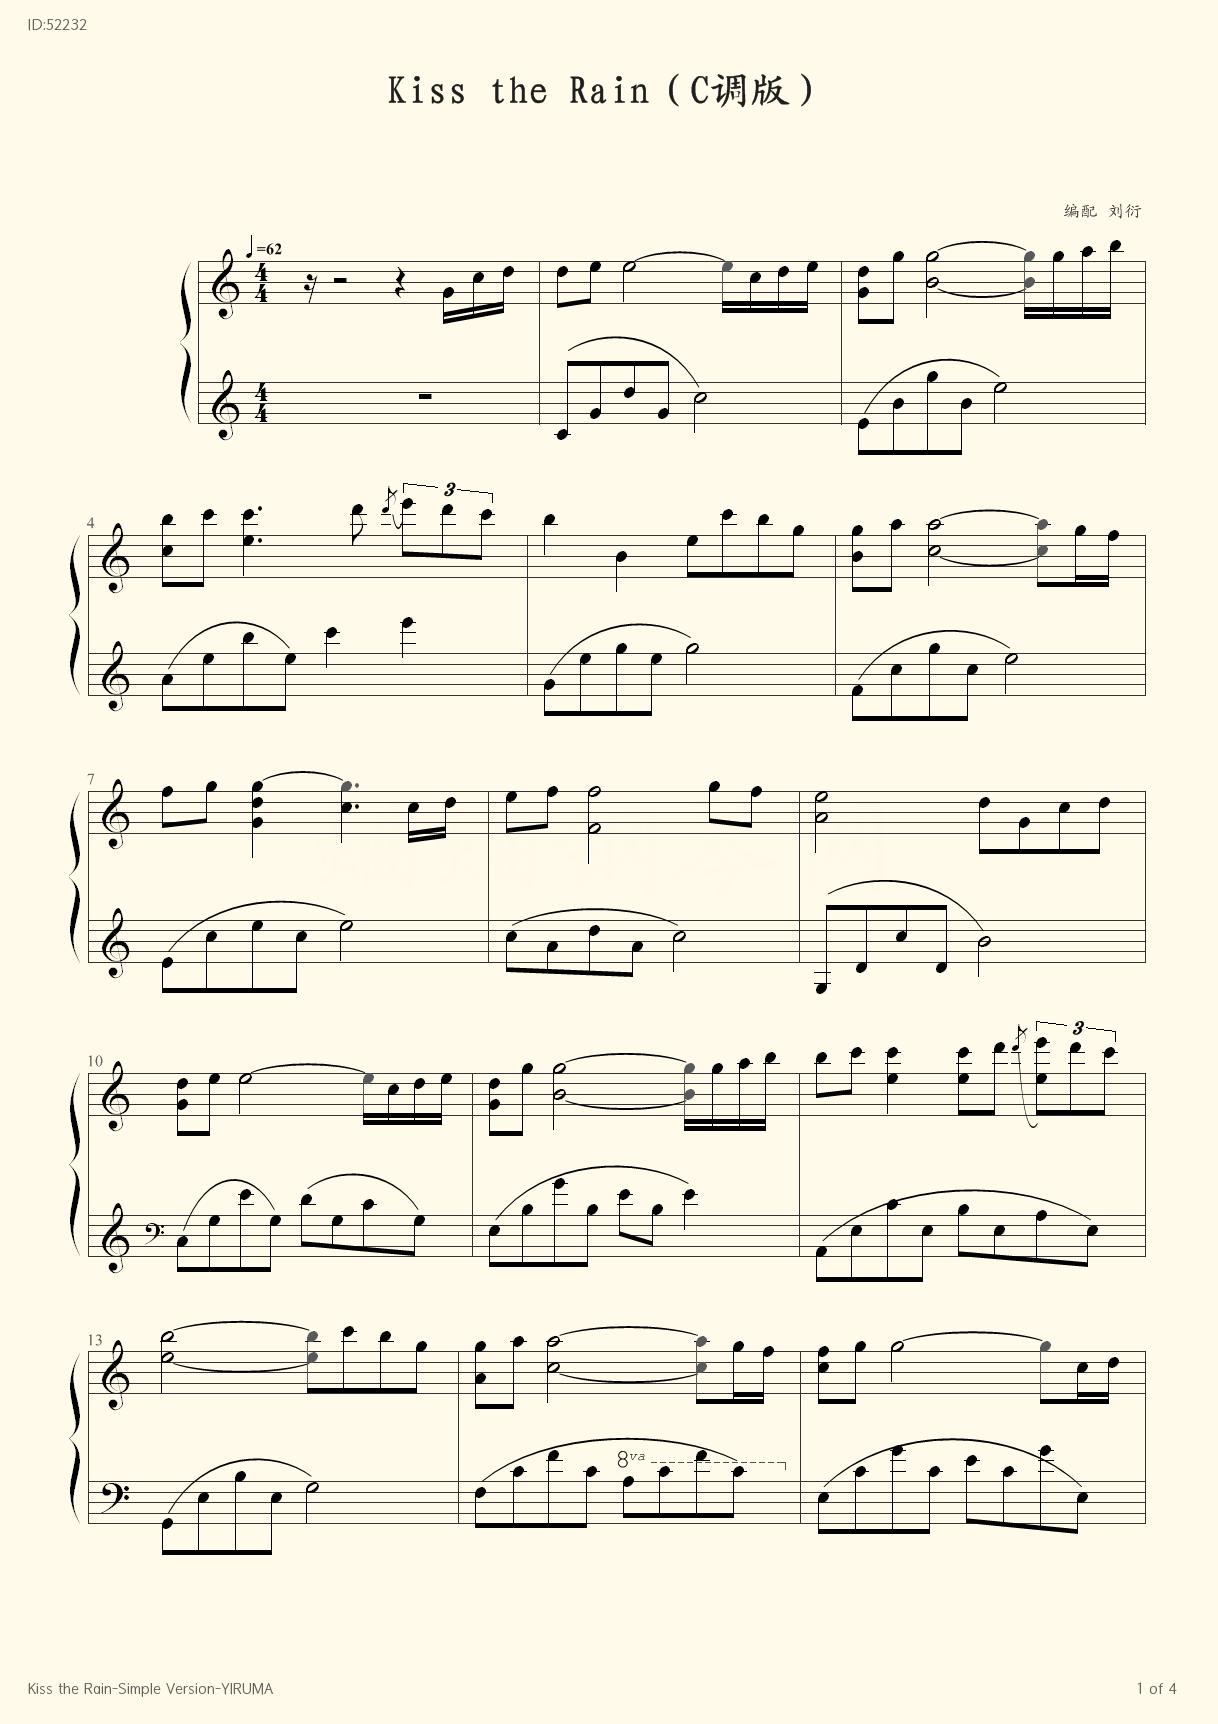 Kiss the Rain Simple Version YIRUMA - YIRUMA - first page